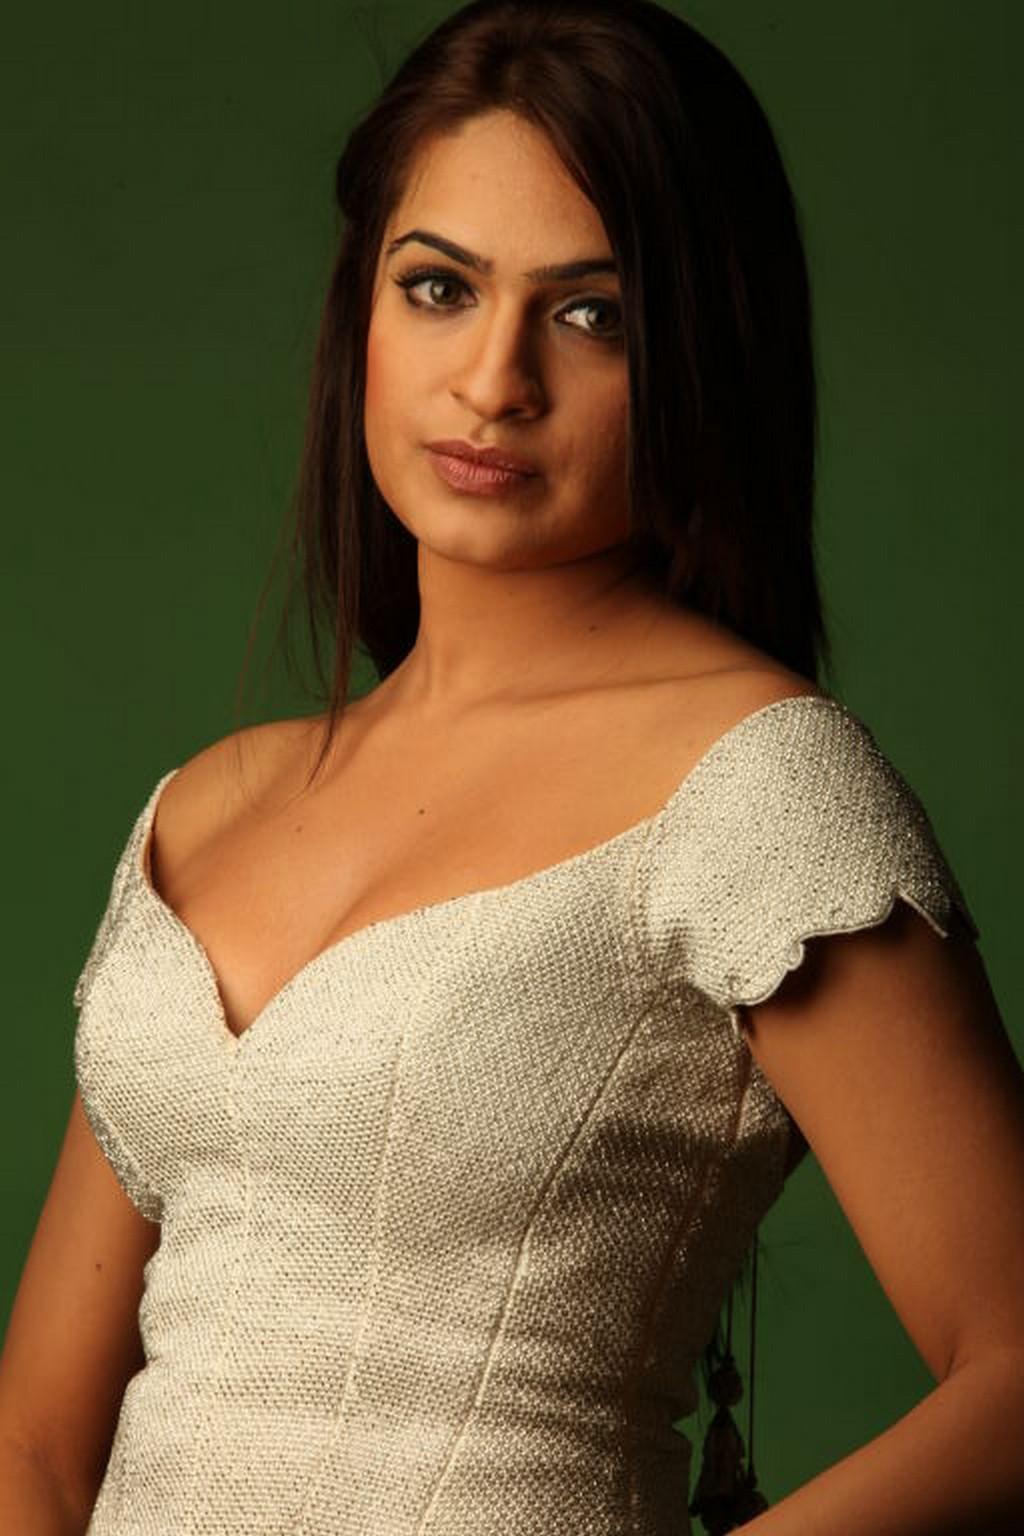 Super-sexy Aditi Agarwal strikes a pose during a photoshoot.